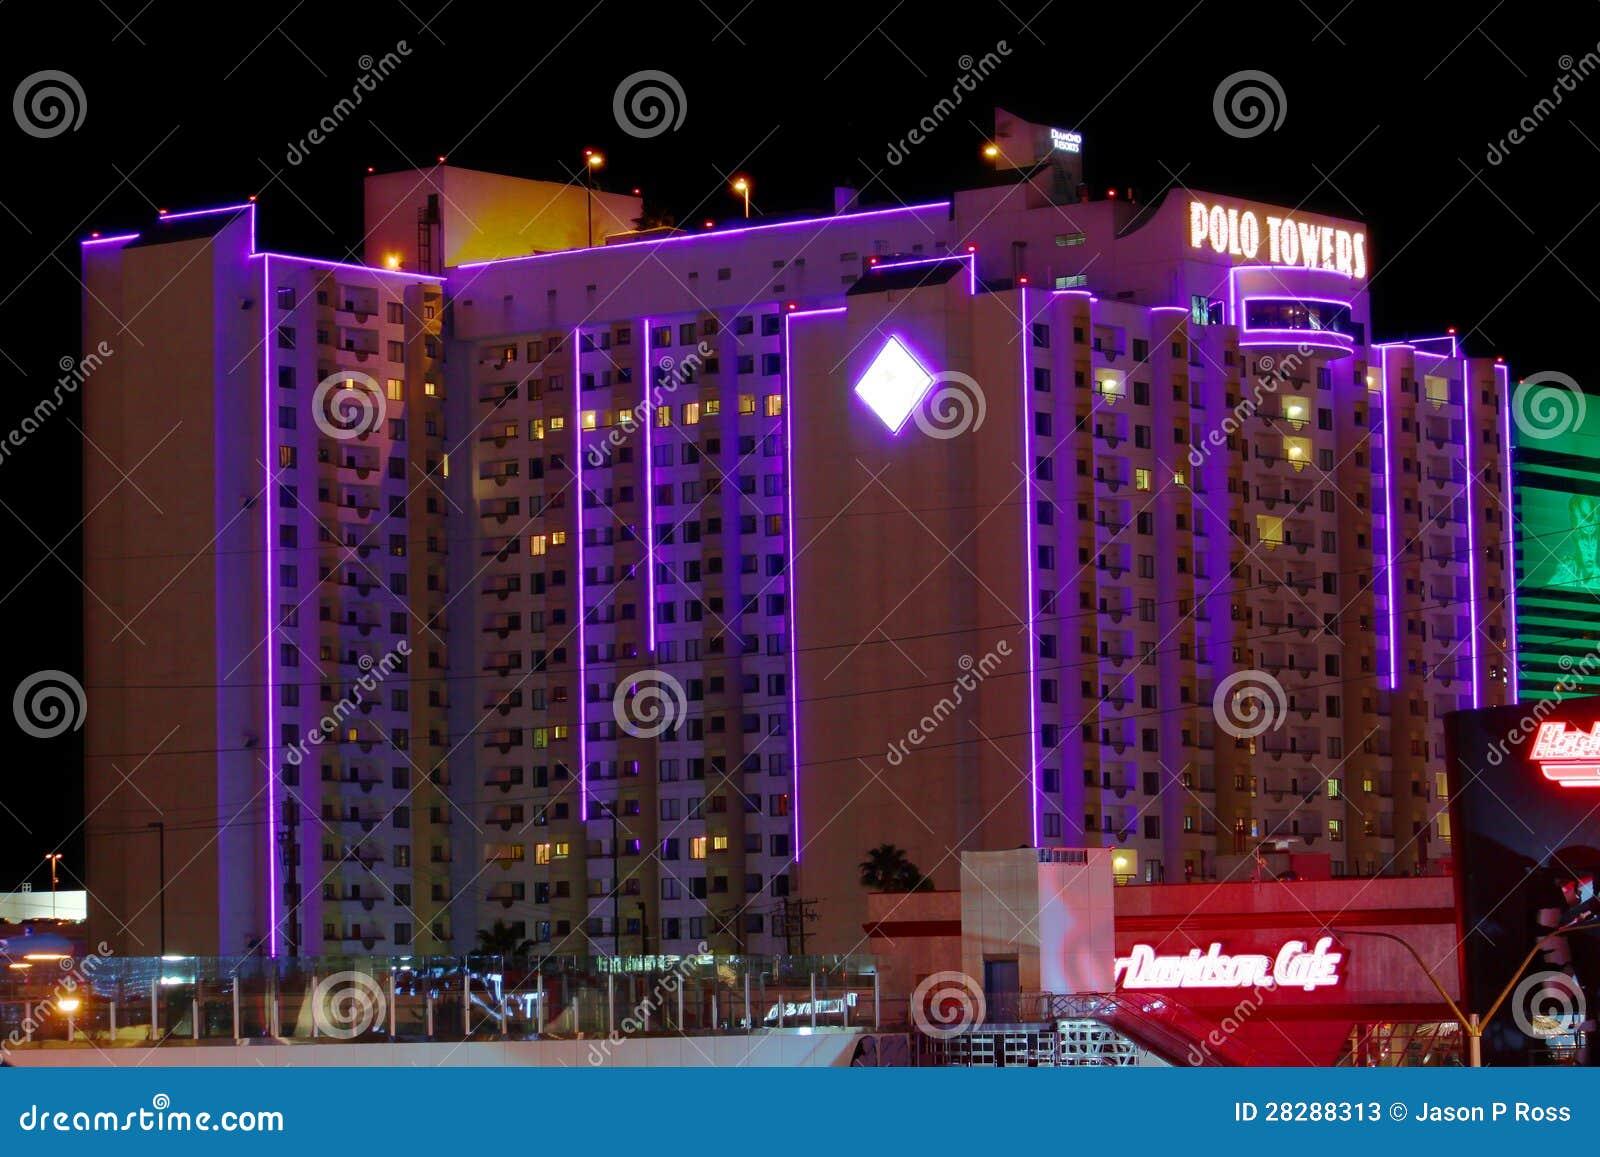 Polo Towers Las Vegas Editorial Photography - Image: 28863917